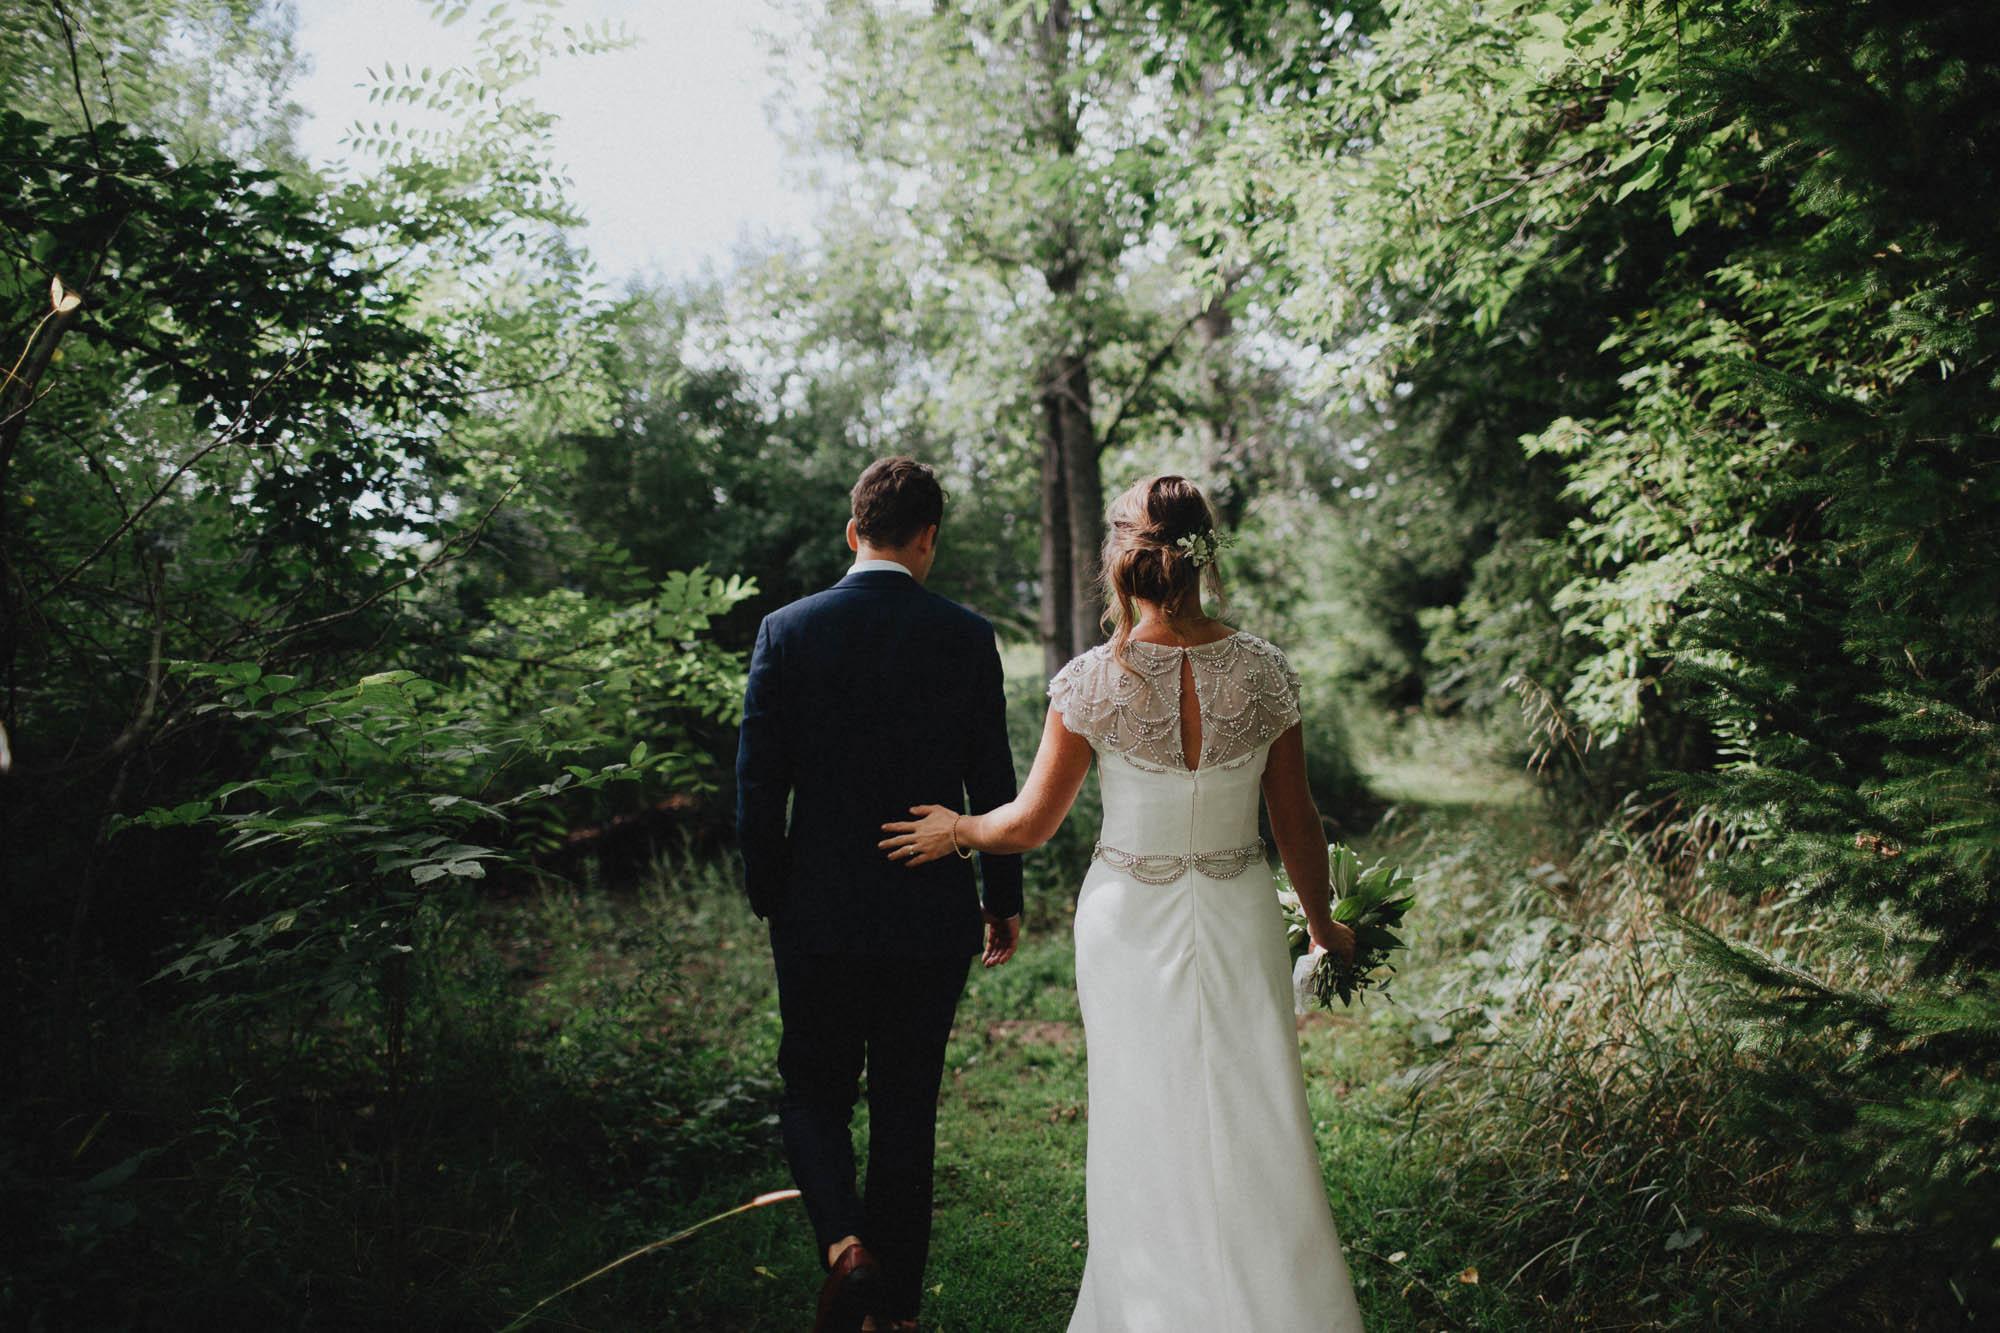 Leah-Graham-Michigan-Outdoor-DIY-Wedding-075@2x.jpg